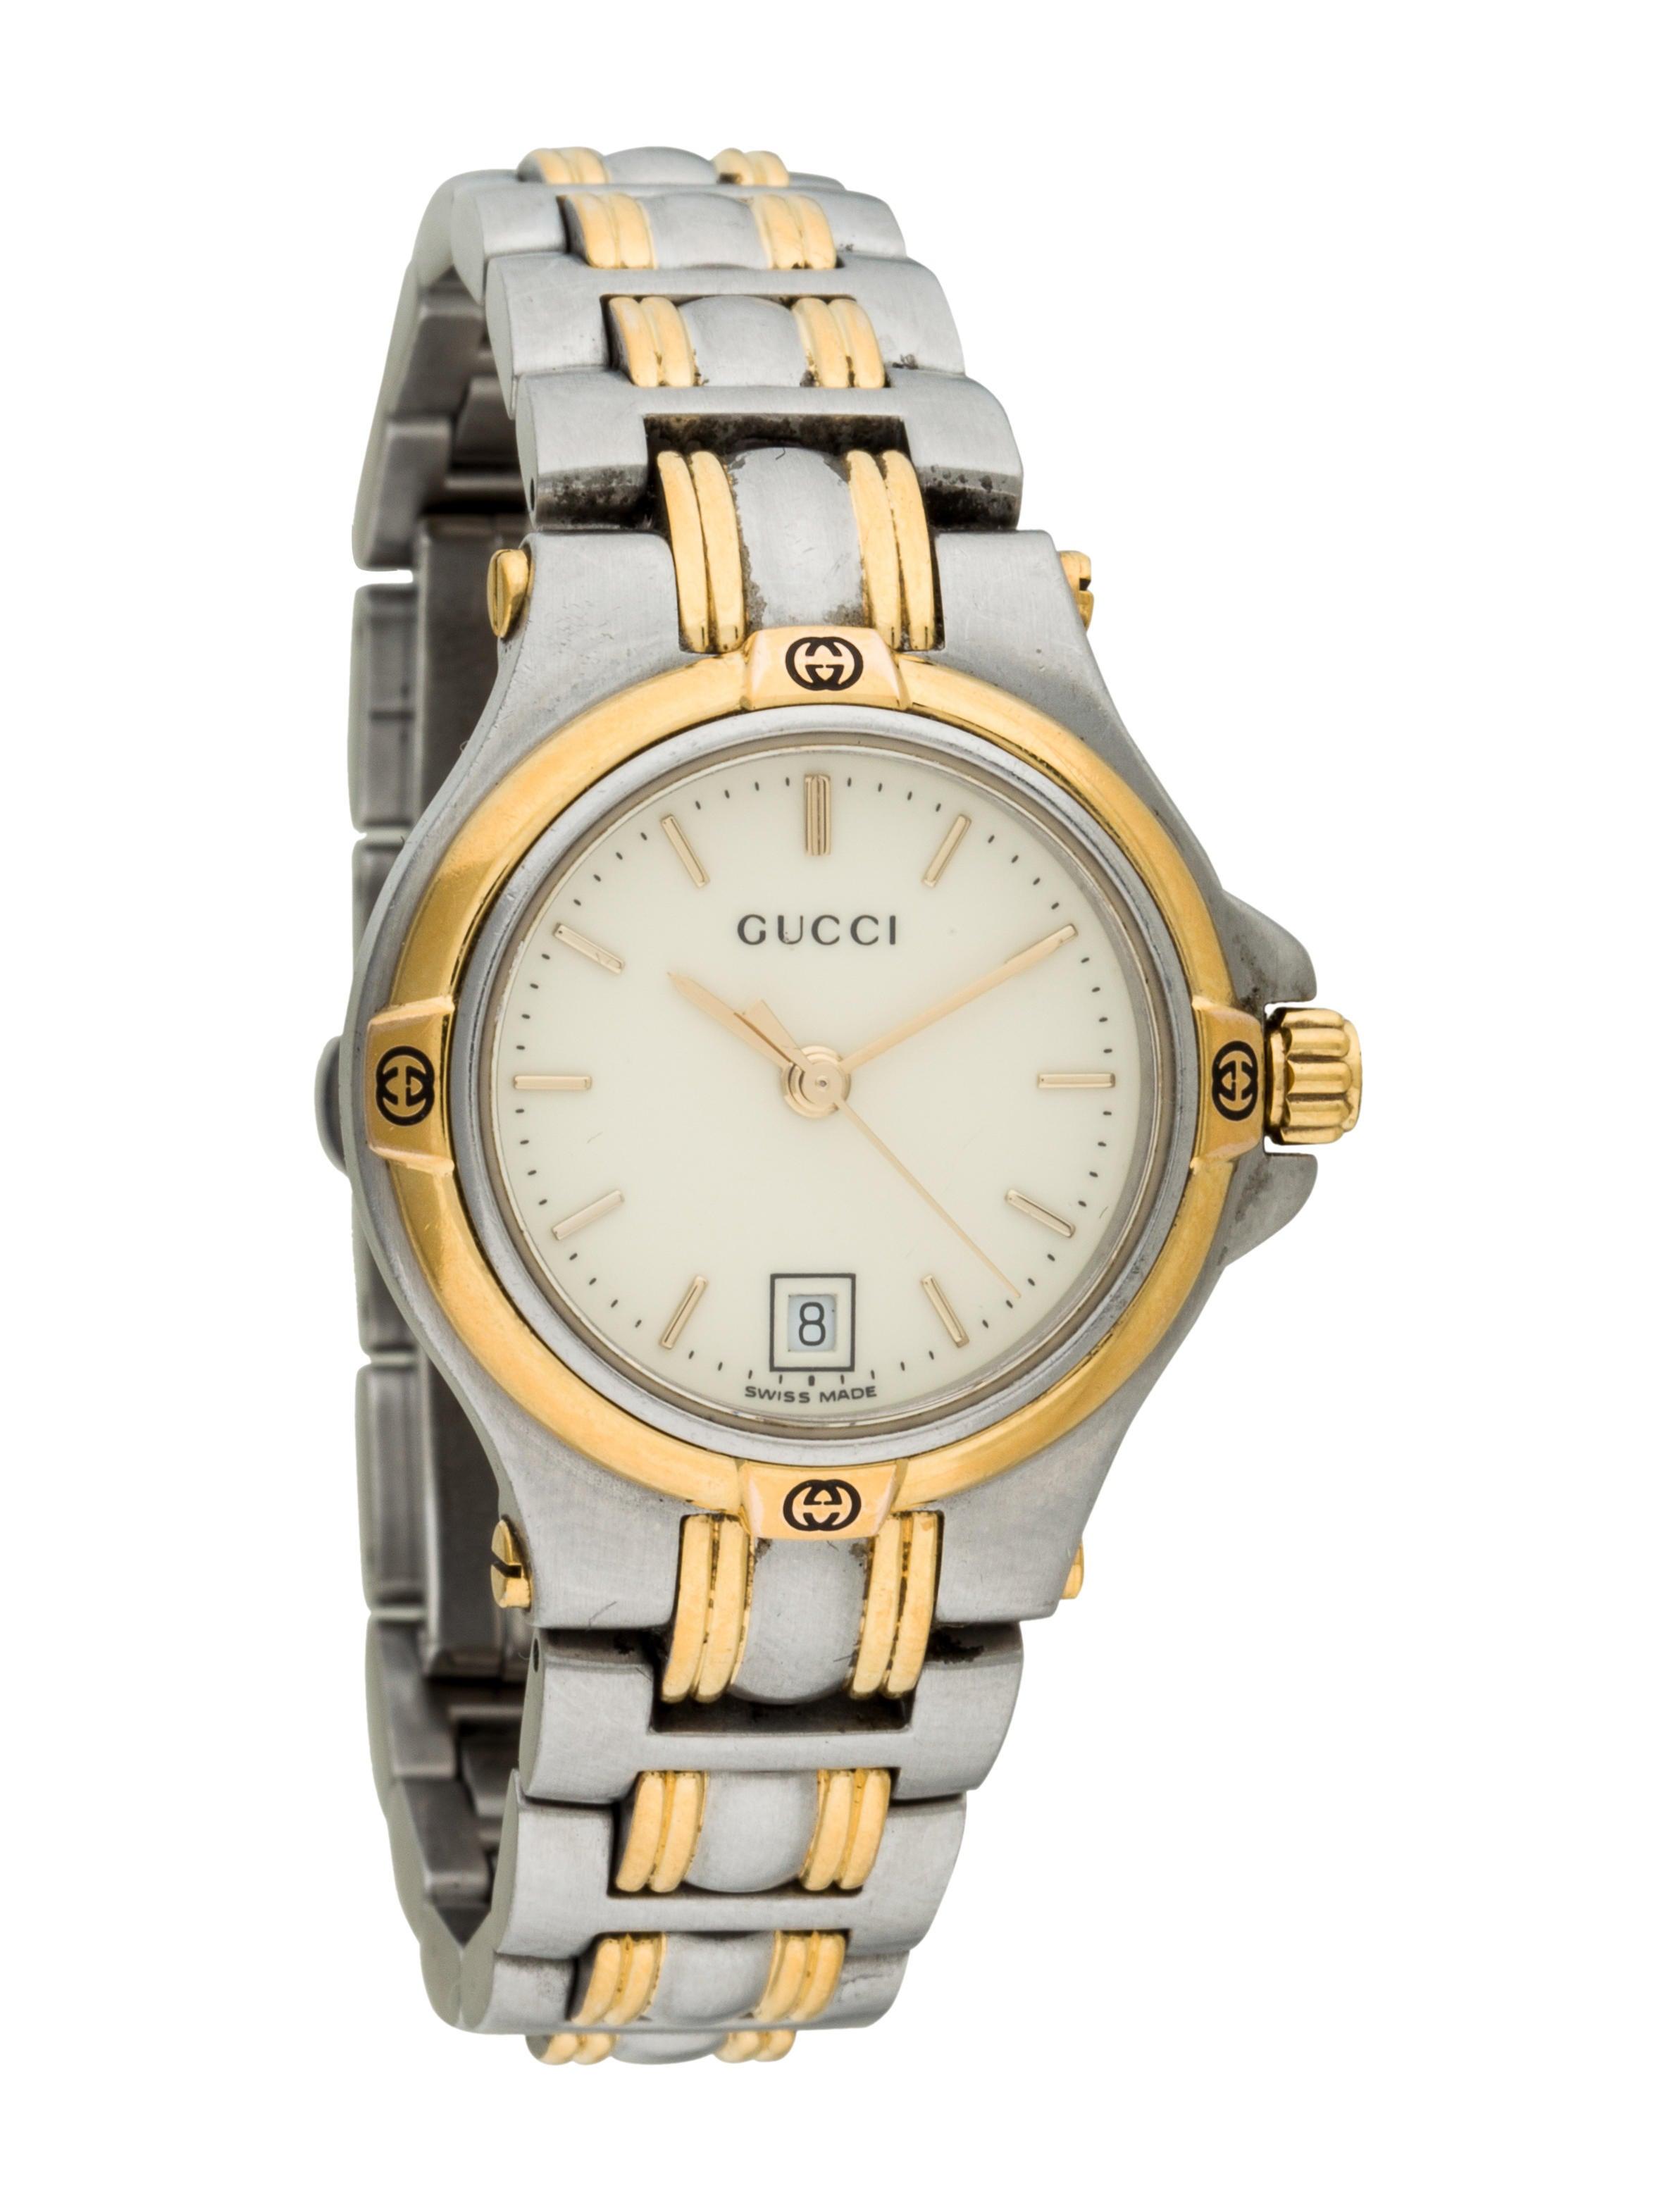 766c15a5210 Gucci 9040 Series Watch - Bracelet - GUC103359